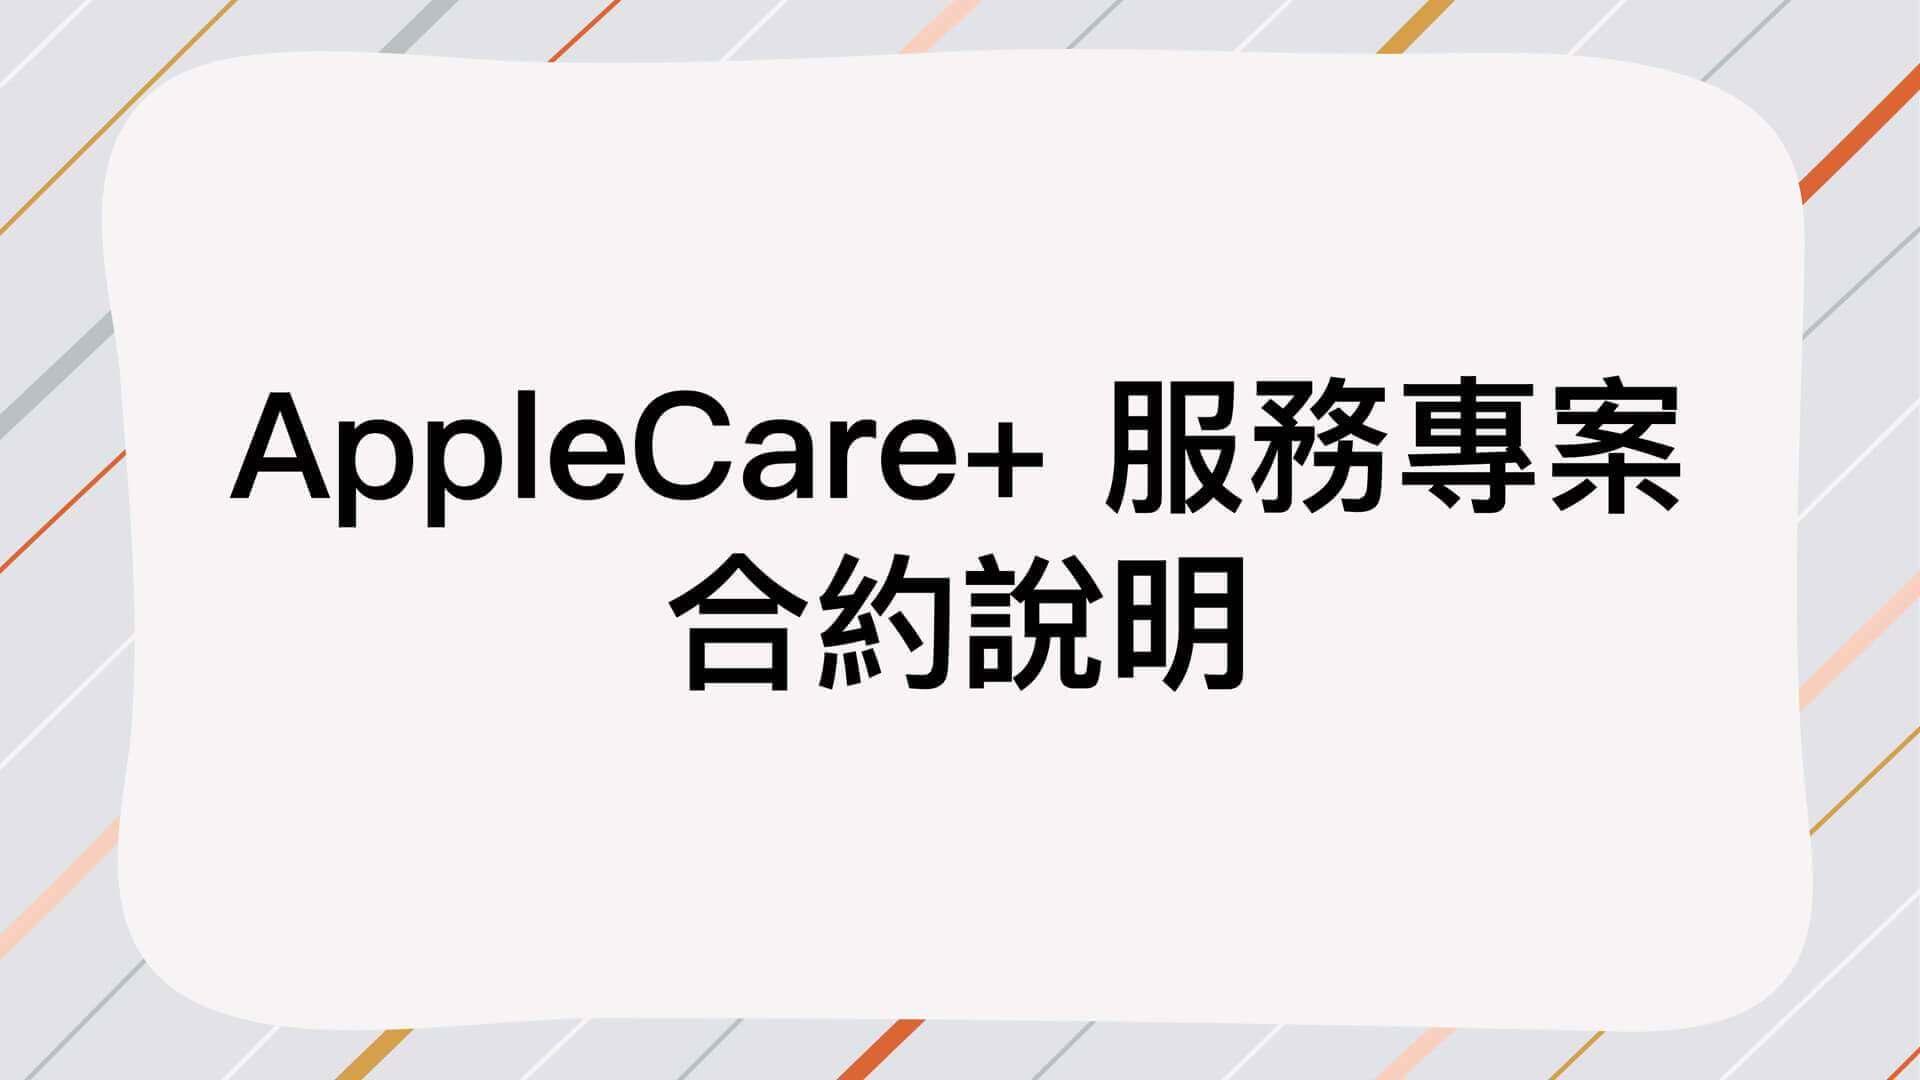 AppleCare+服務專案 合約異常說明